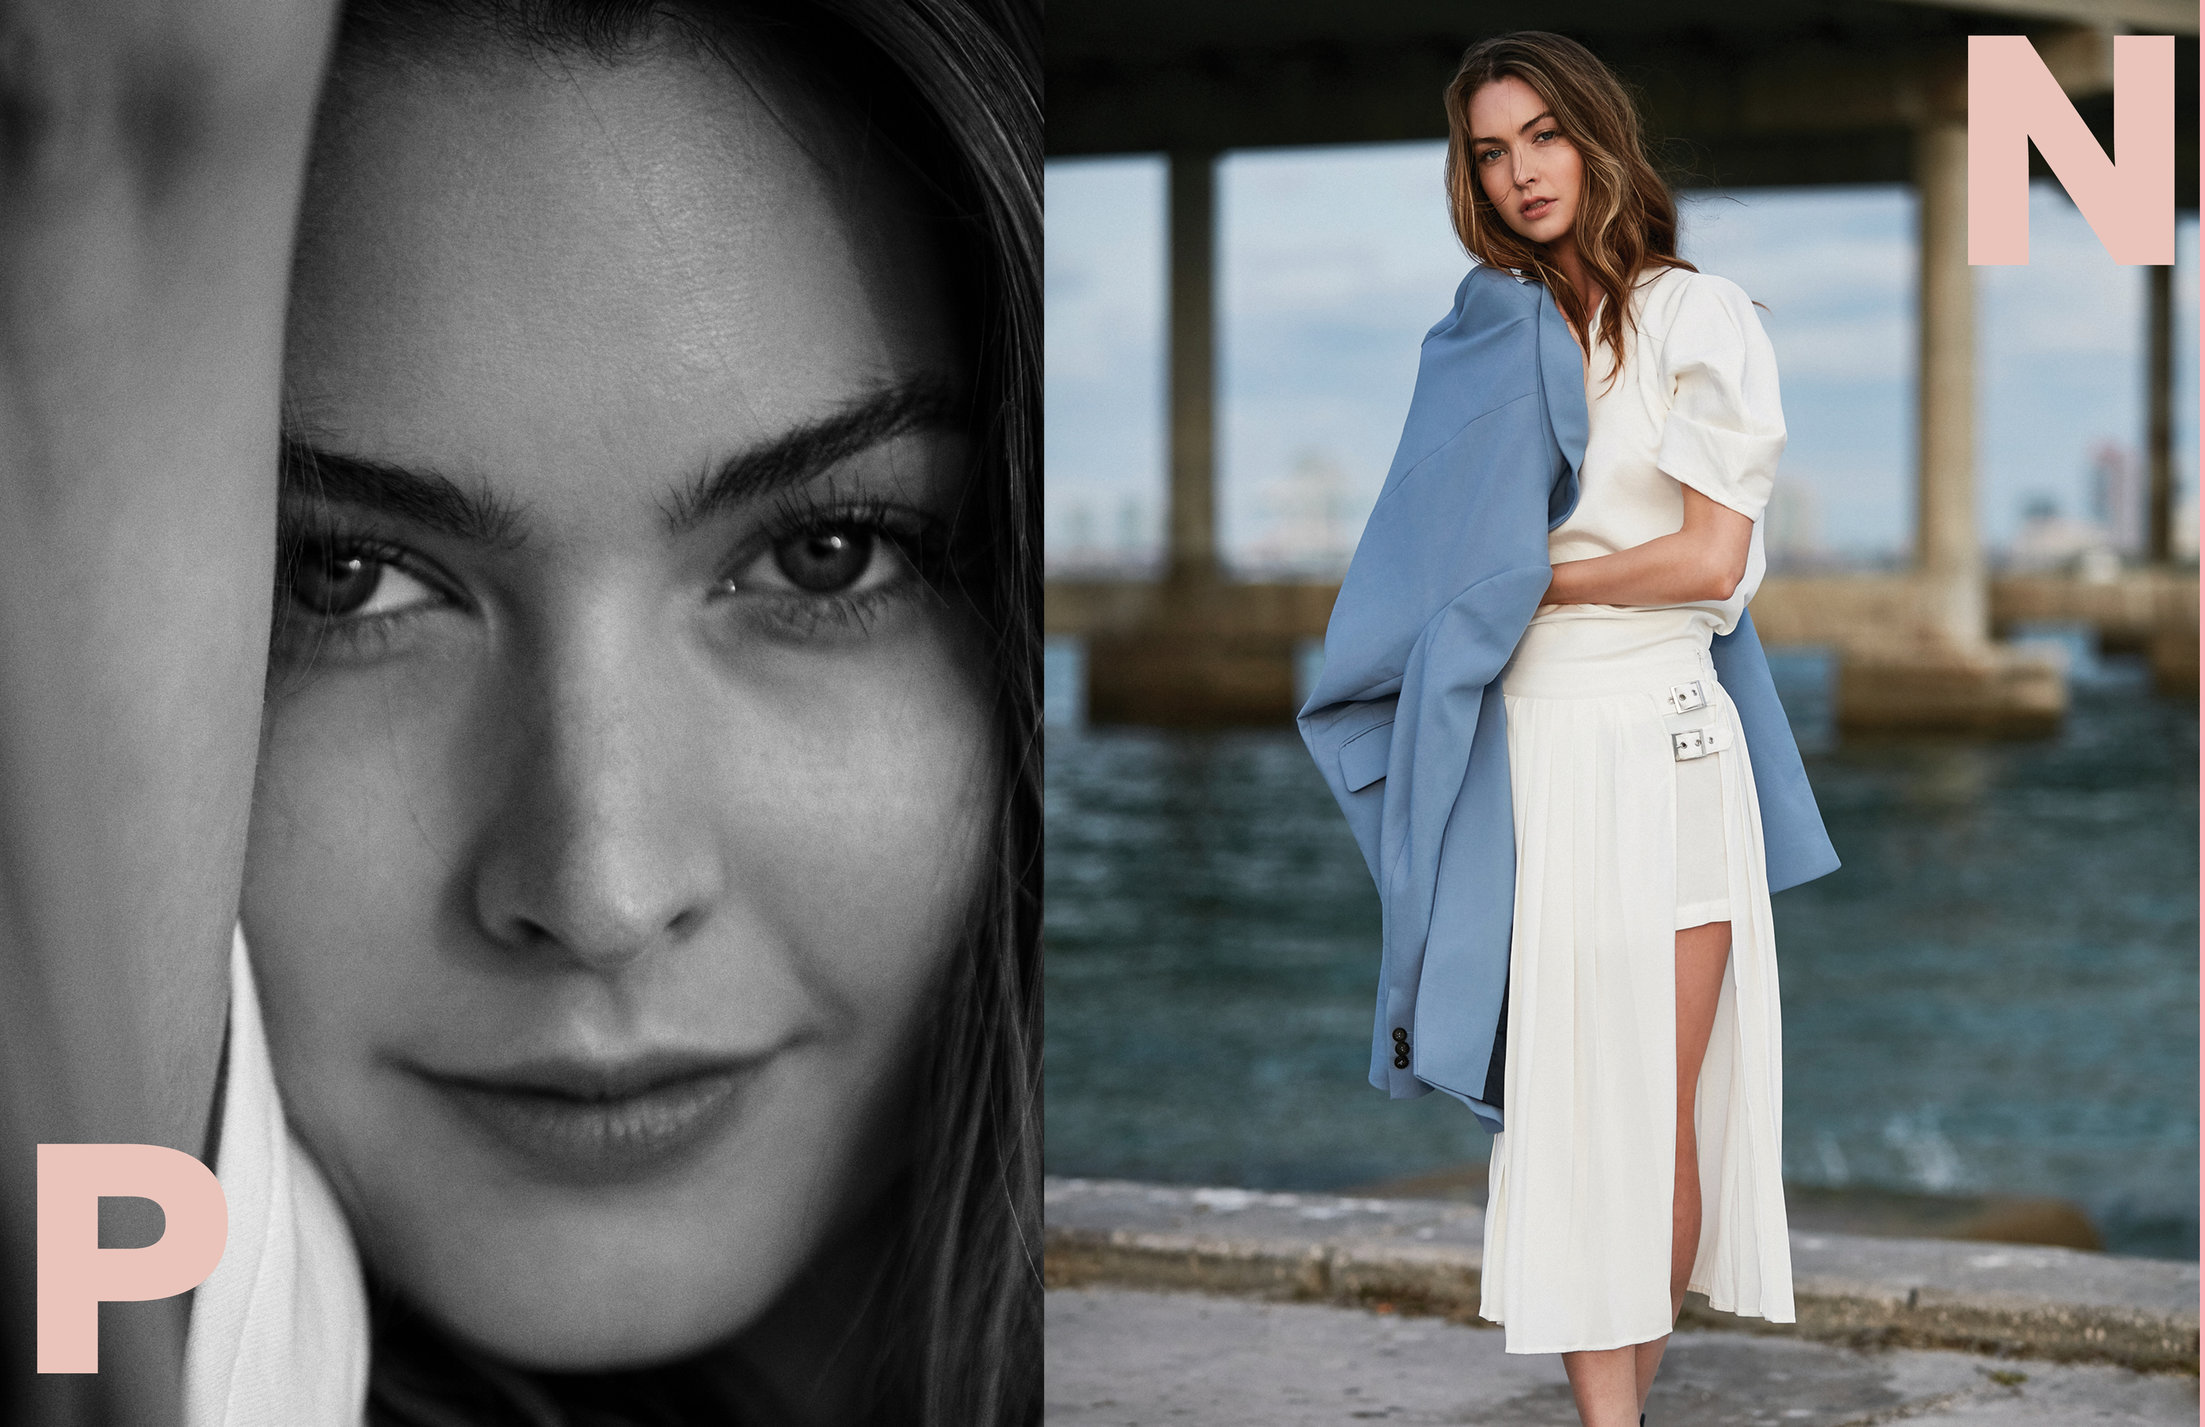 laken-bw_beach-model-fashion-photographer-nico-stipcianos-miami-copy.jpg